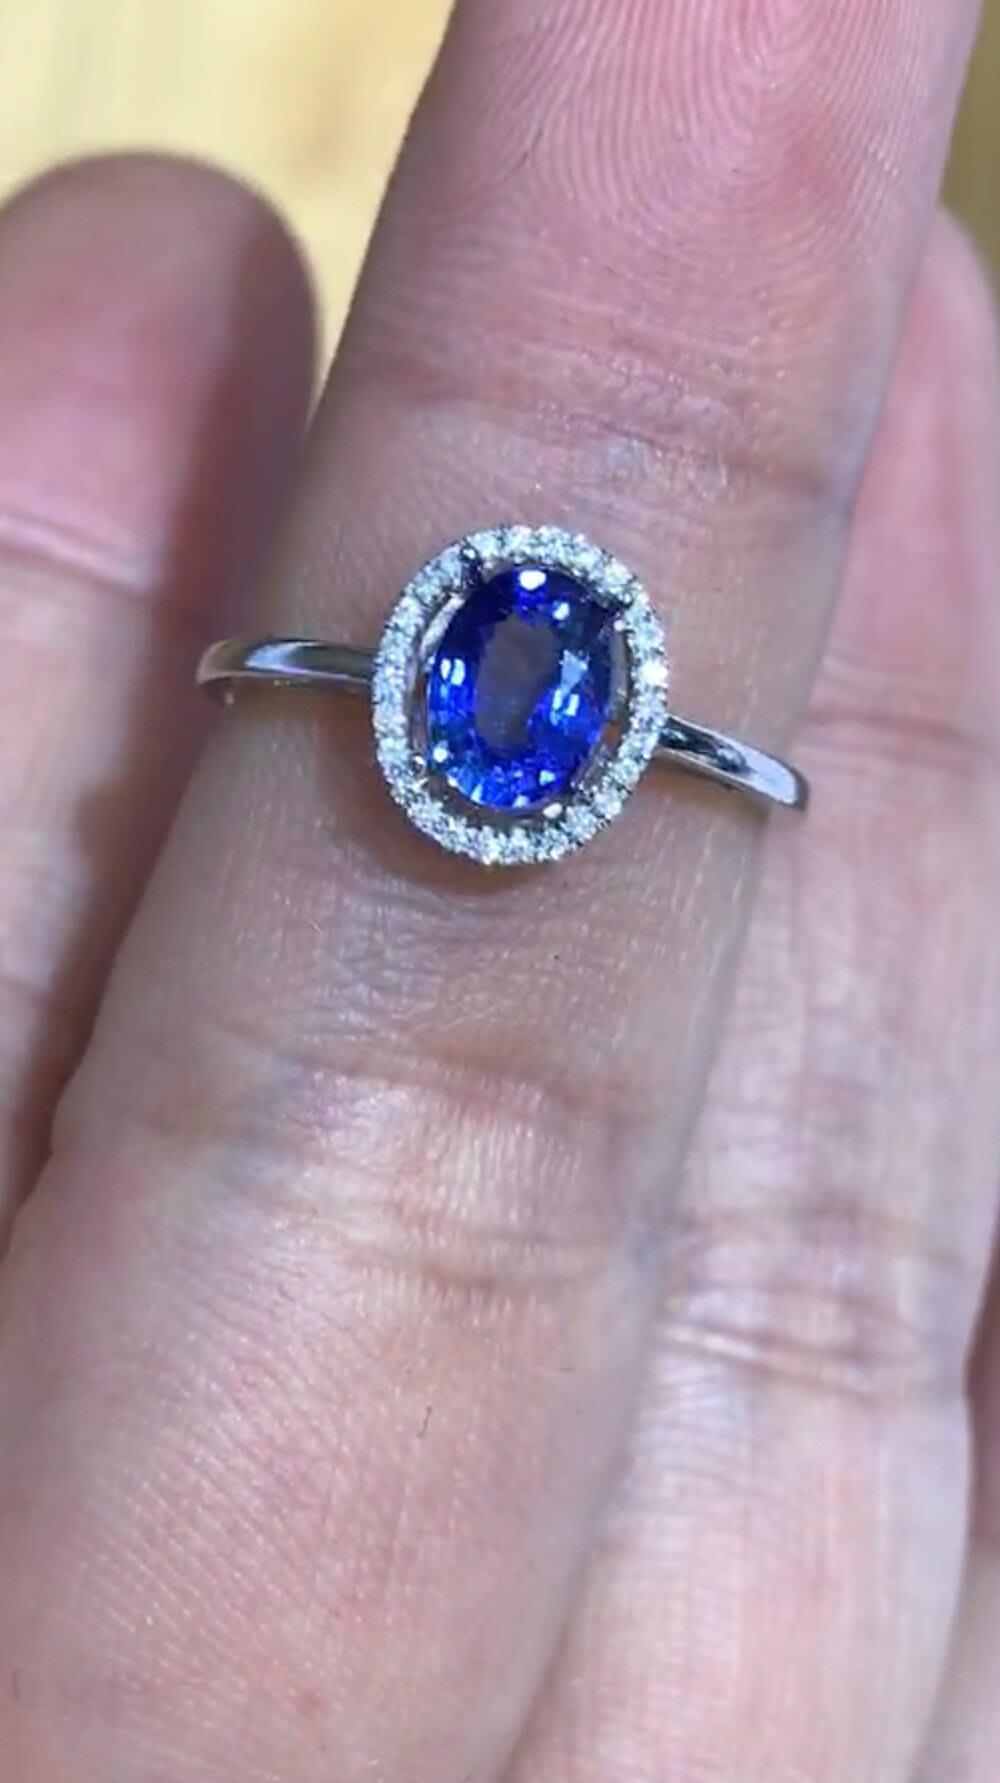 【18K金藍寶石戒指】18K金斯里蘭卡天然藍寶石戒指 純天然無燒 Vivid Blue 火光超好!